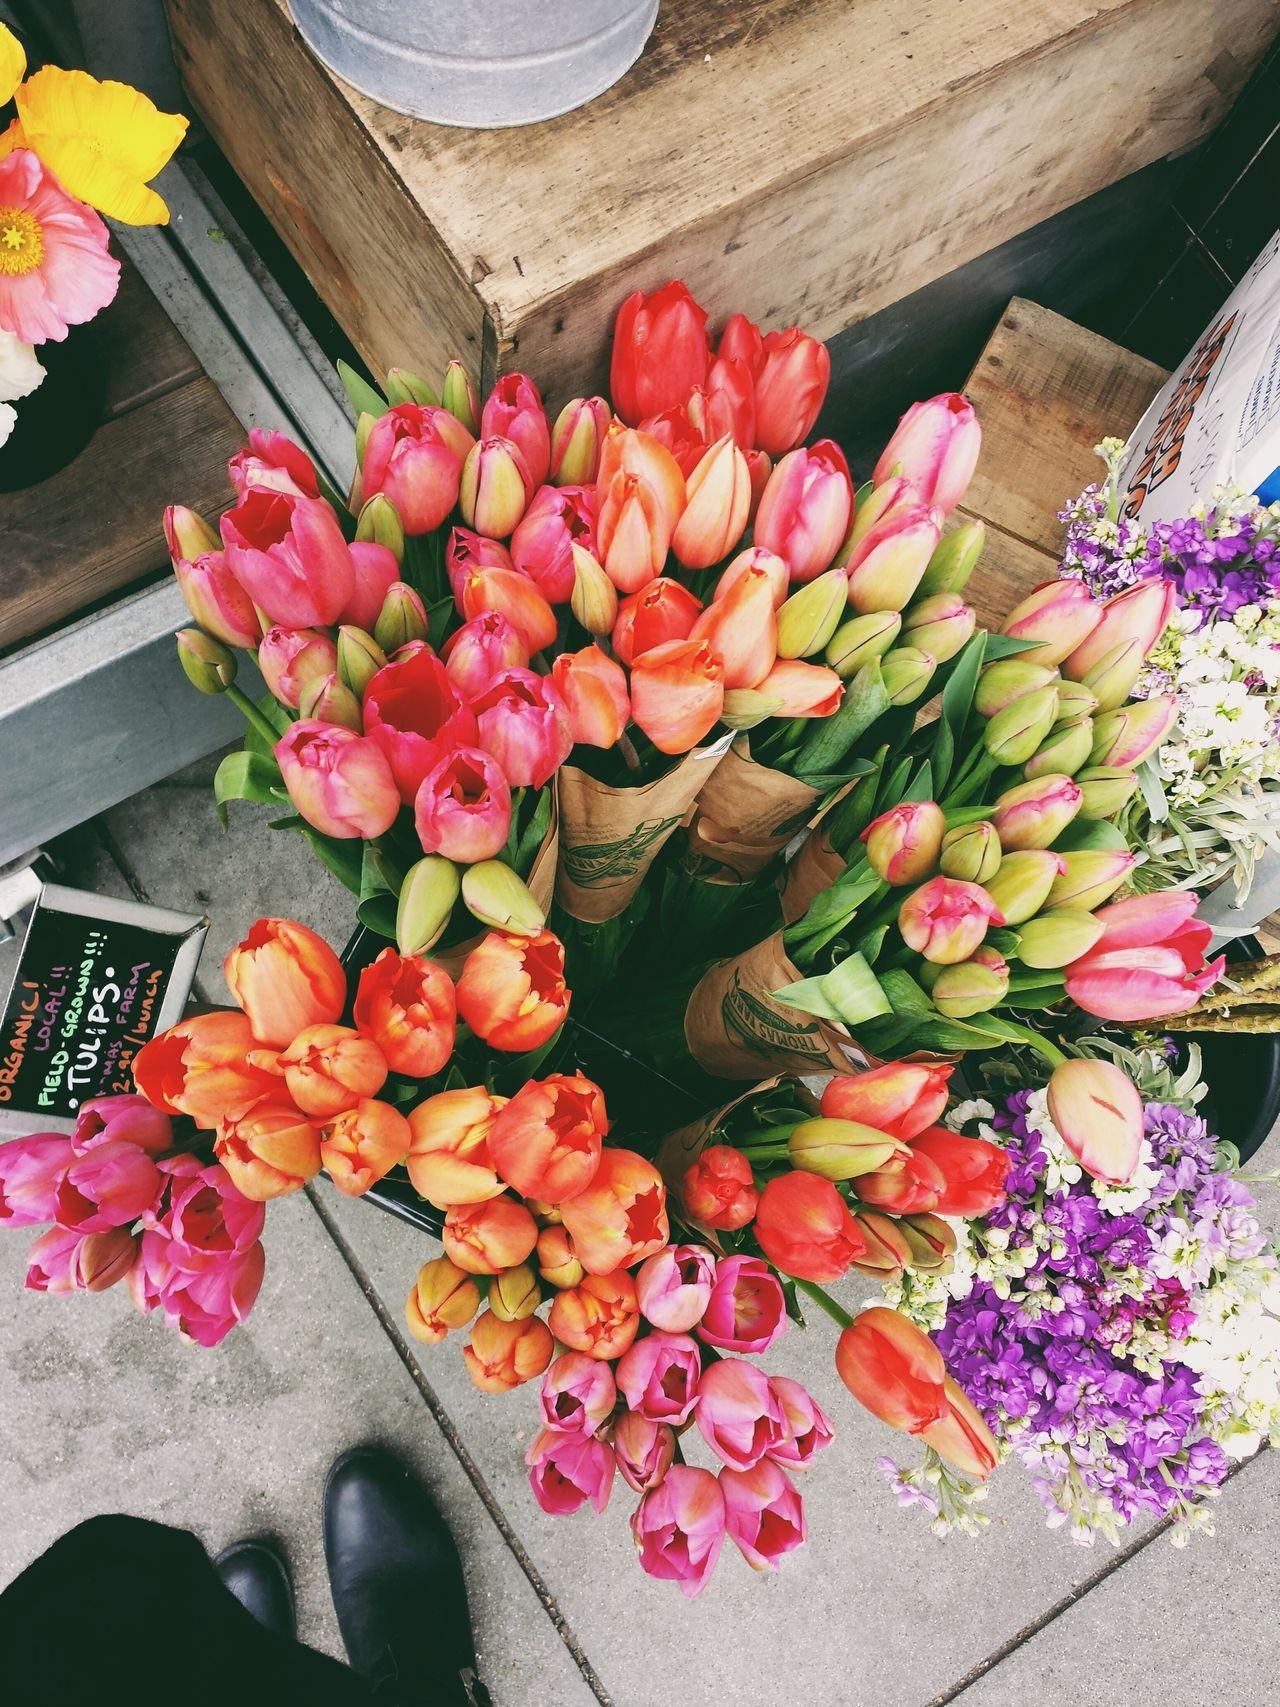 Mazzo Di Fiori Tumblr.P I N T E R E S T Caliaye Fiori Bellissimi Fiori Tulipani